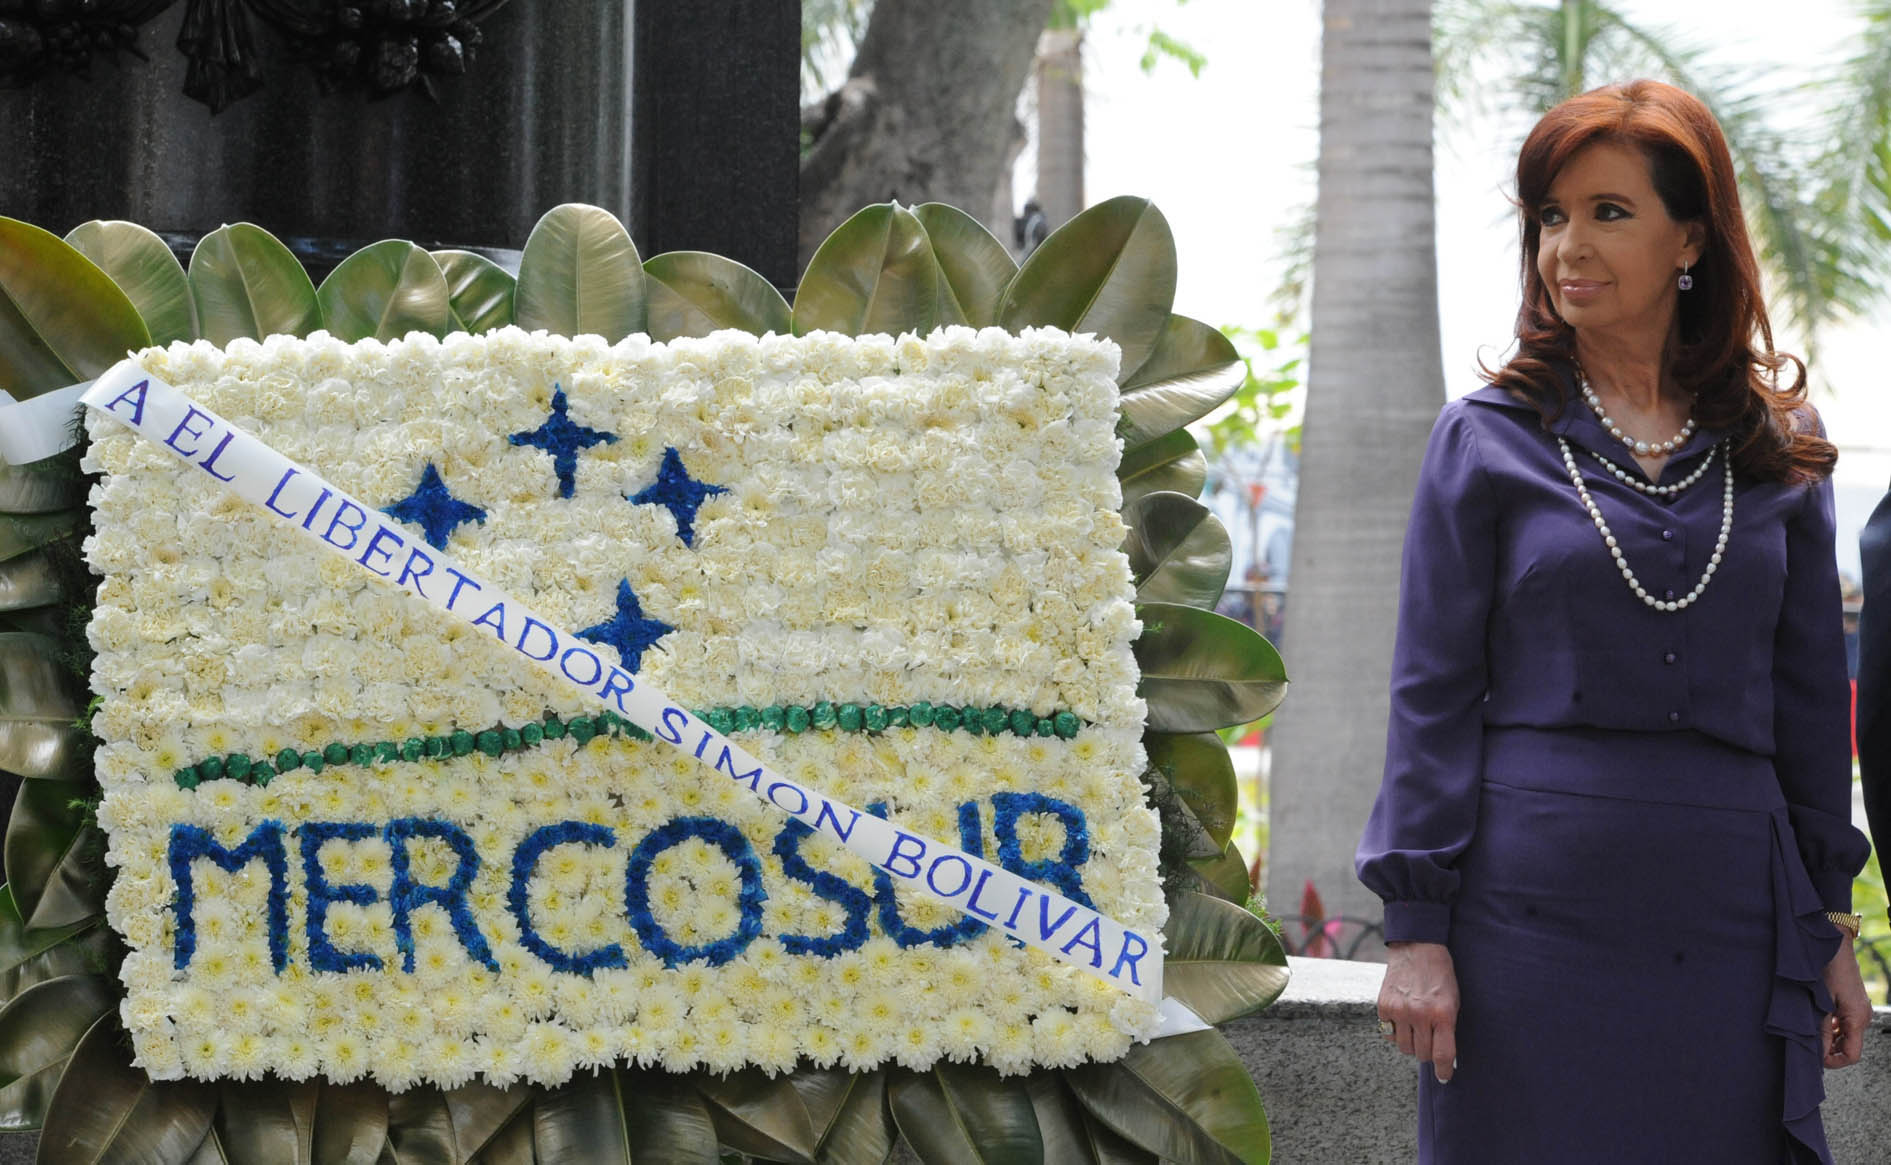 MERCOSUR_2014_CARACAS_CasaRosada_05_CFK_BanderaMercosur